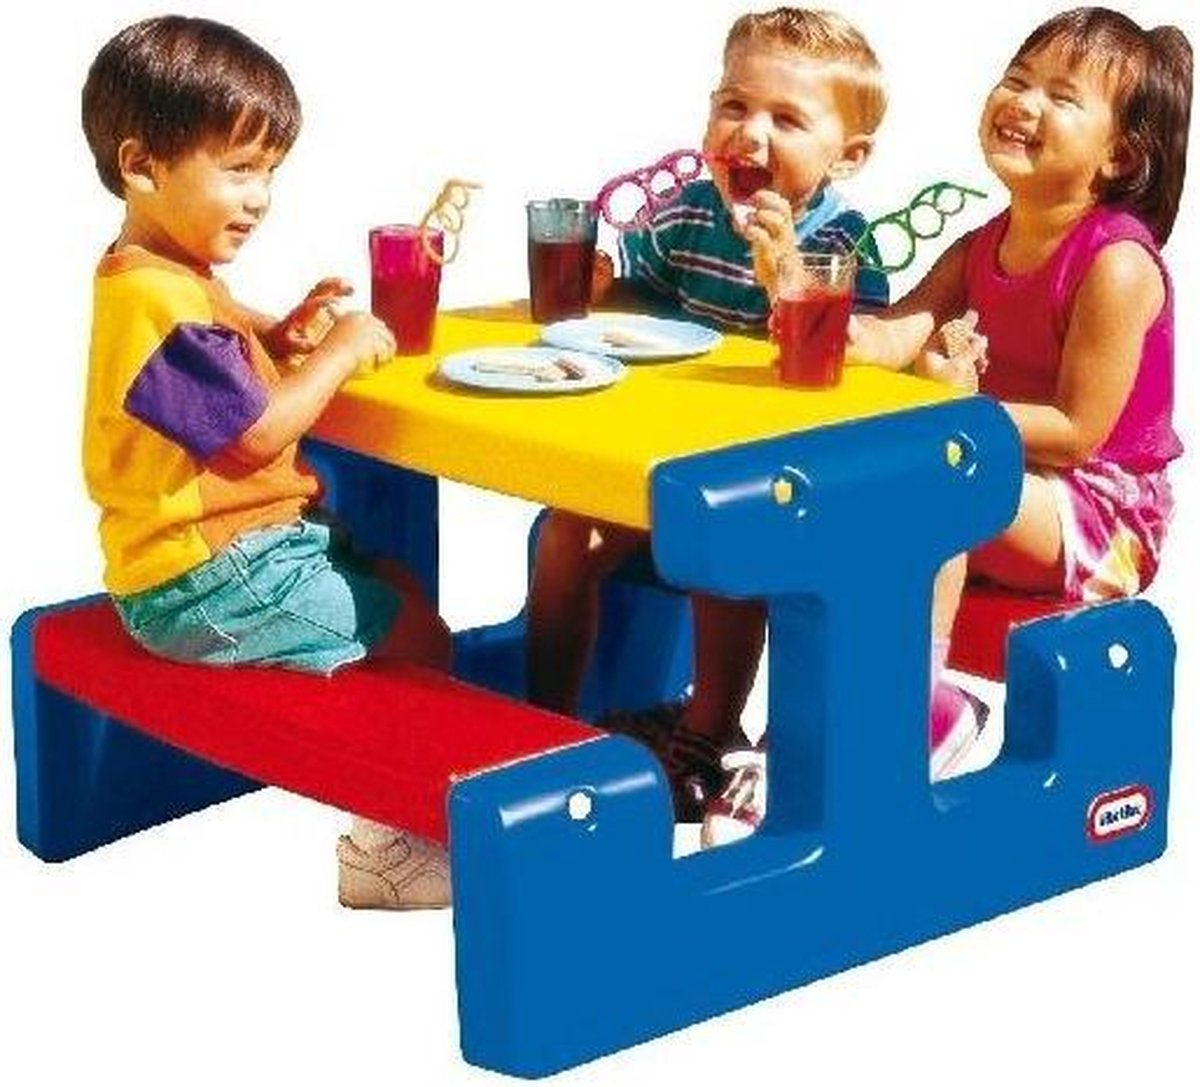 Little Tikes Picknicktafel Primary - kinder picknick tafel - kinder speeltoestel - speeltafel